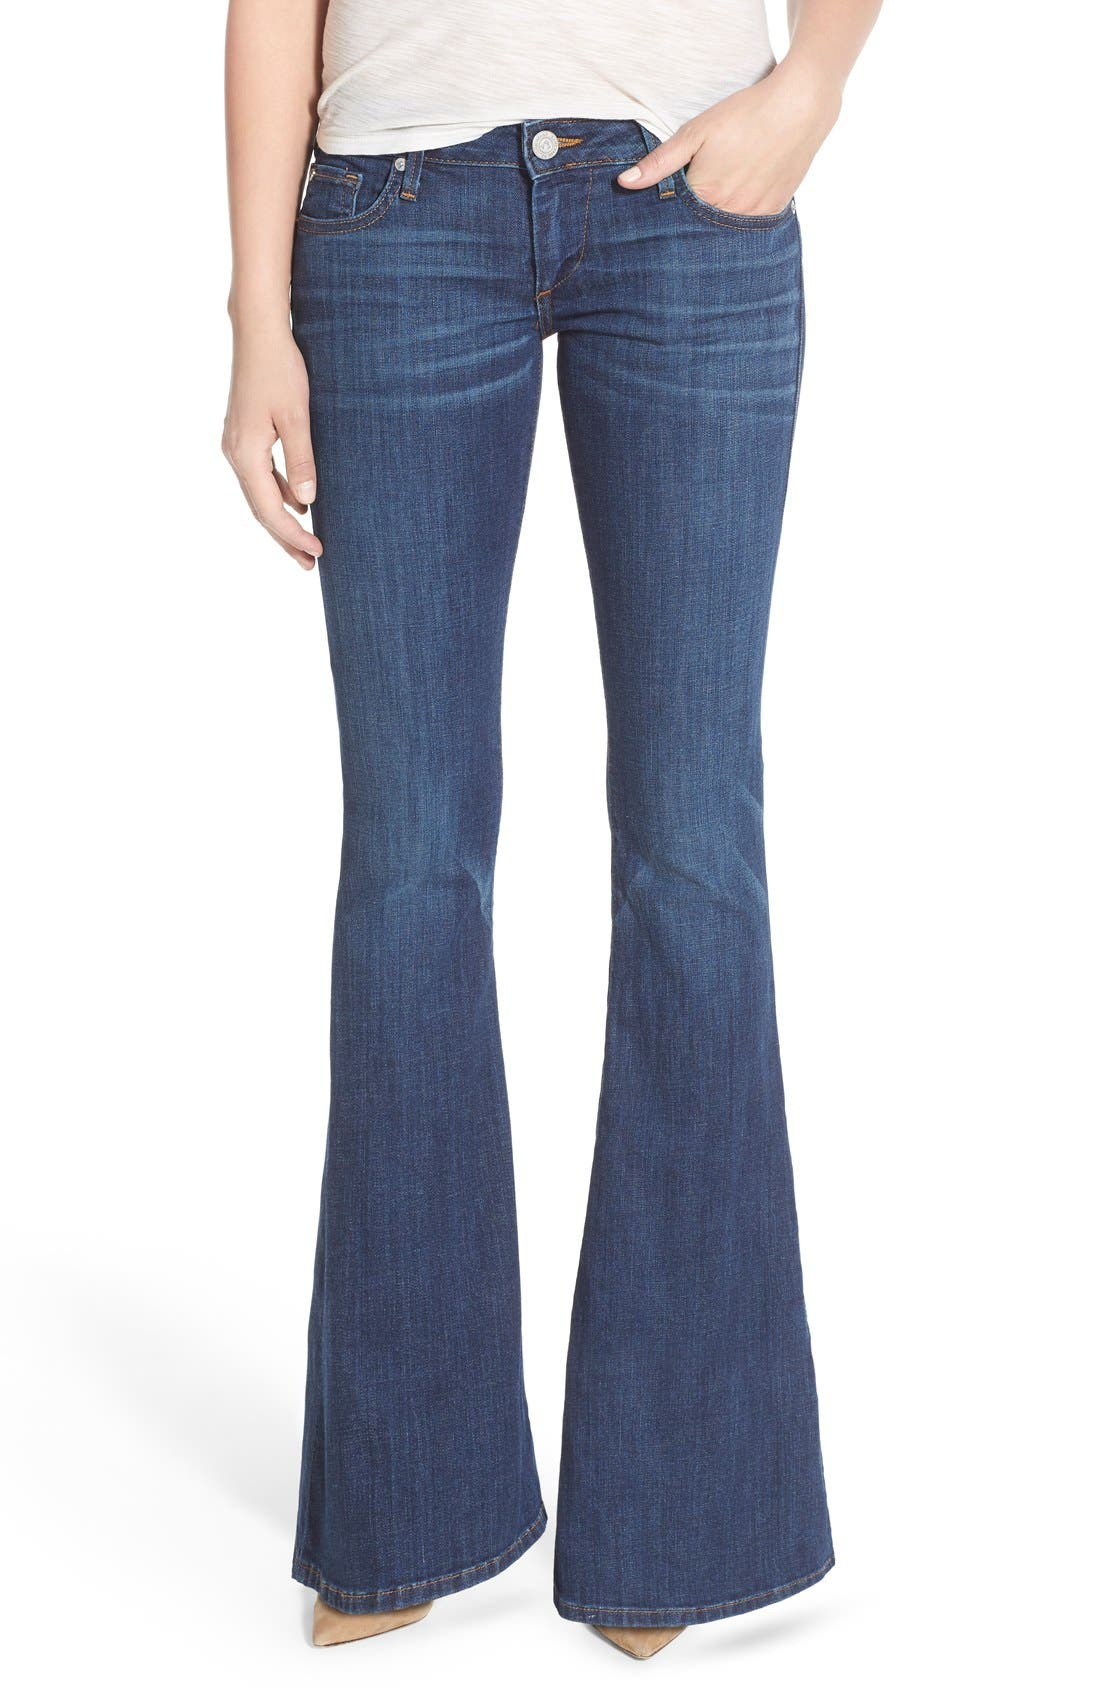 Main Image - True Religion Brand Jeans 'Karlie' Bell Bottom Jeans (Worn Vintage)